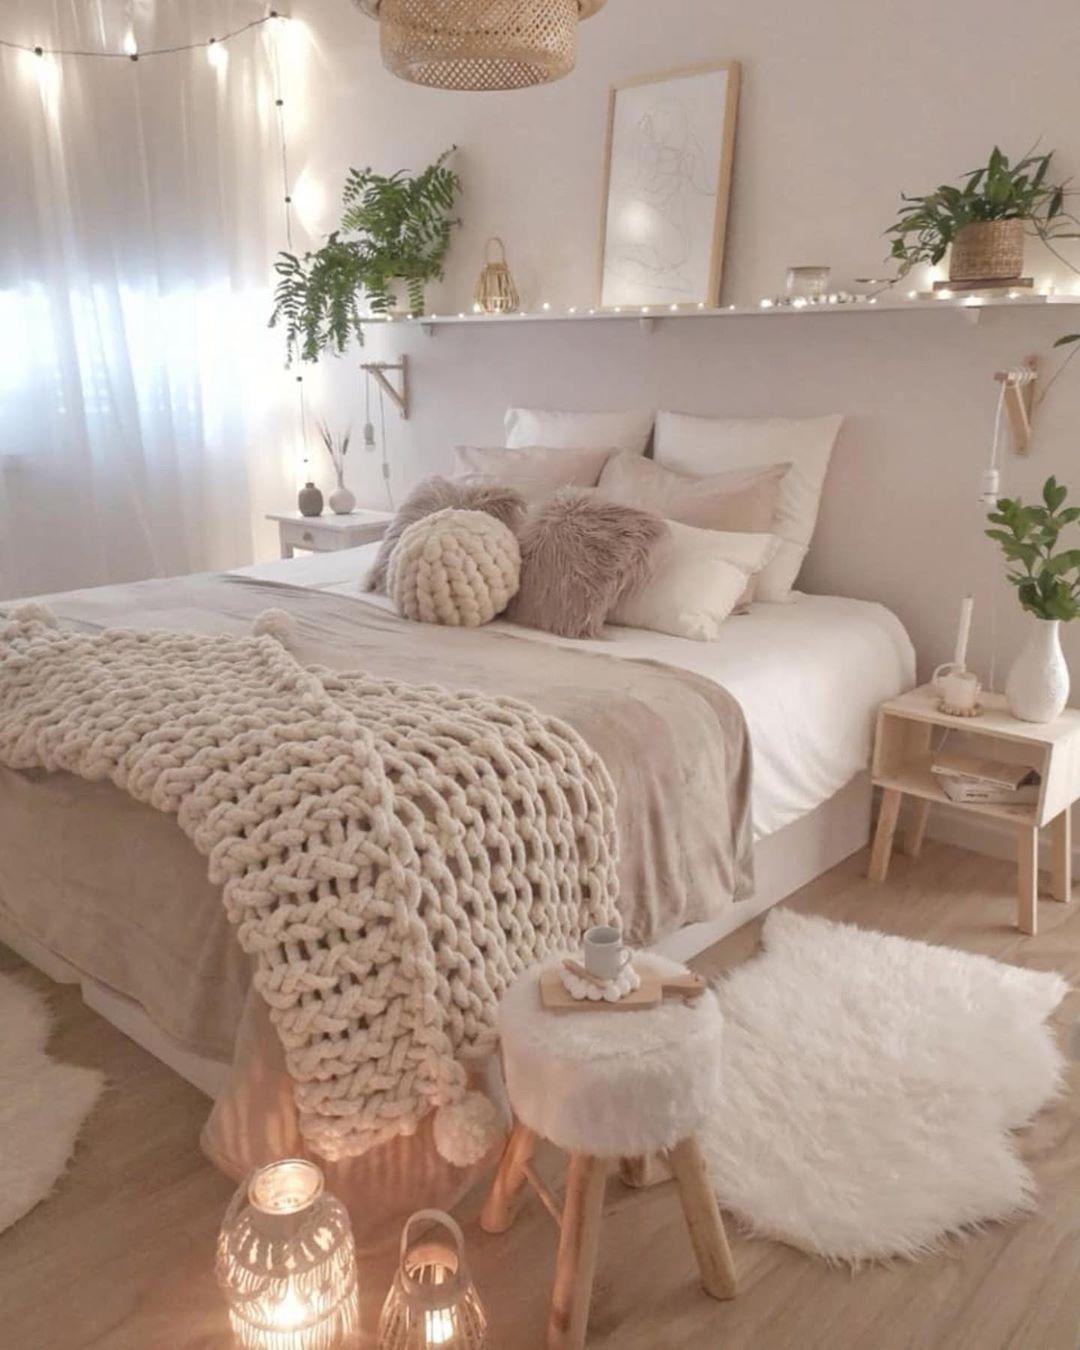 "Home Decor Inspiration ♡ on Instagram: ""via @my_homely_decor"